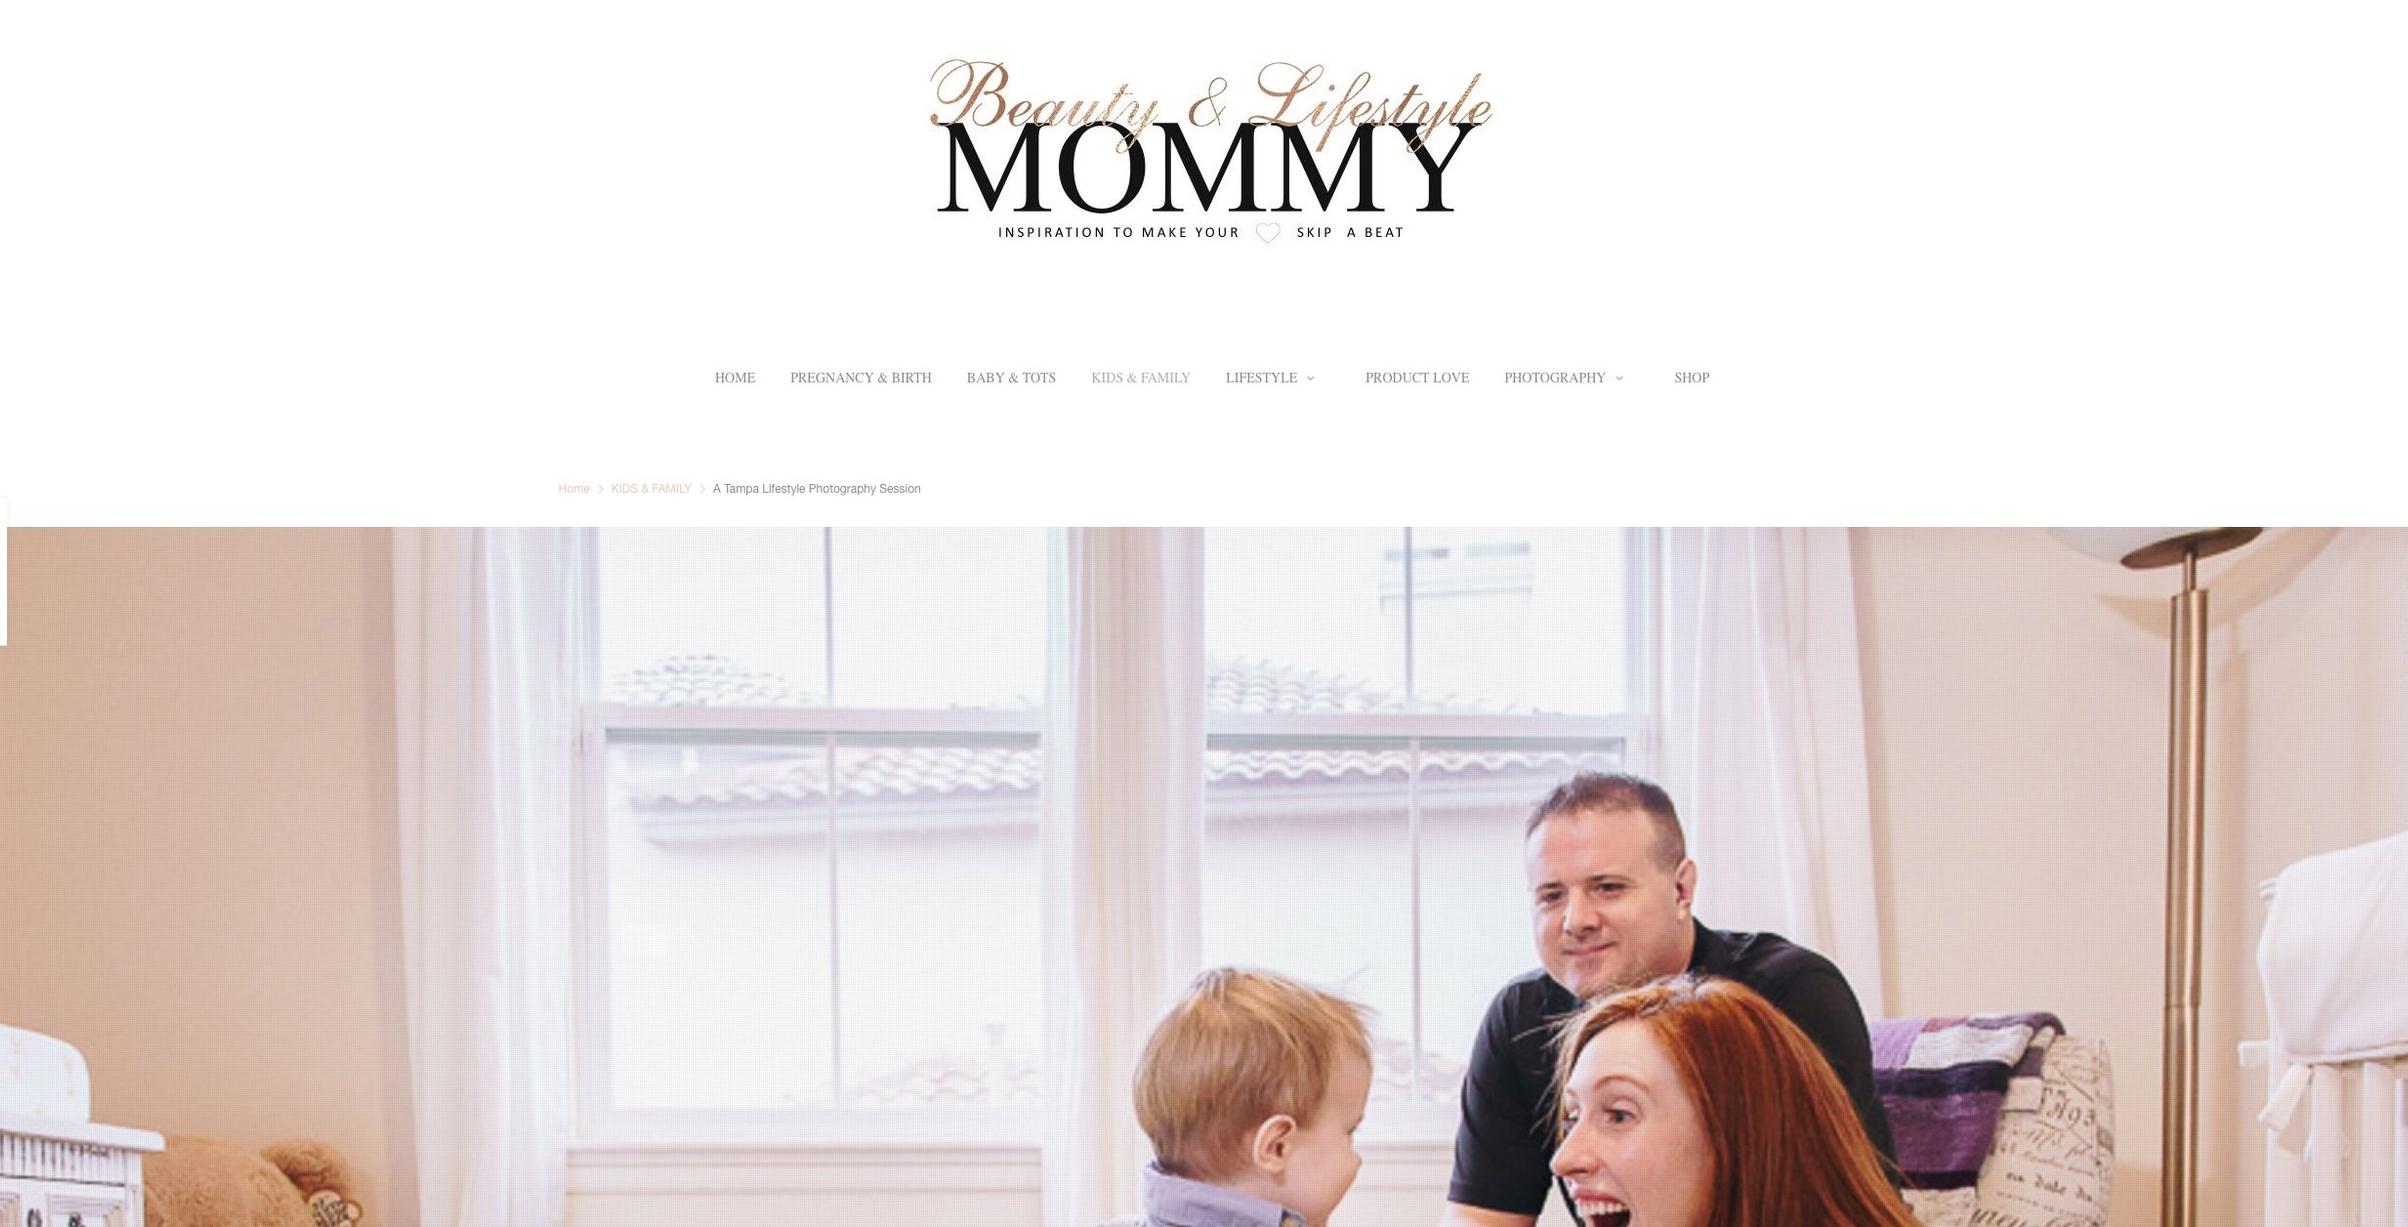 lifestyle-session, beauty-and-lifestyle-mommy-magazine